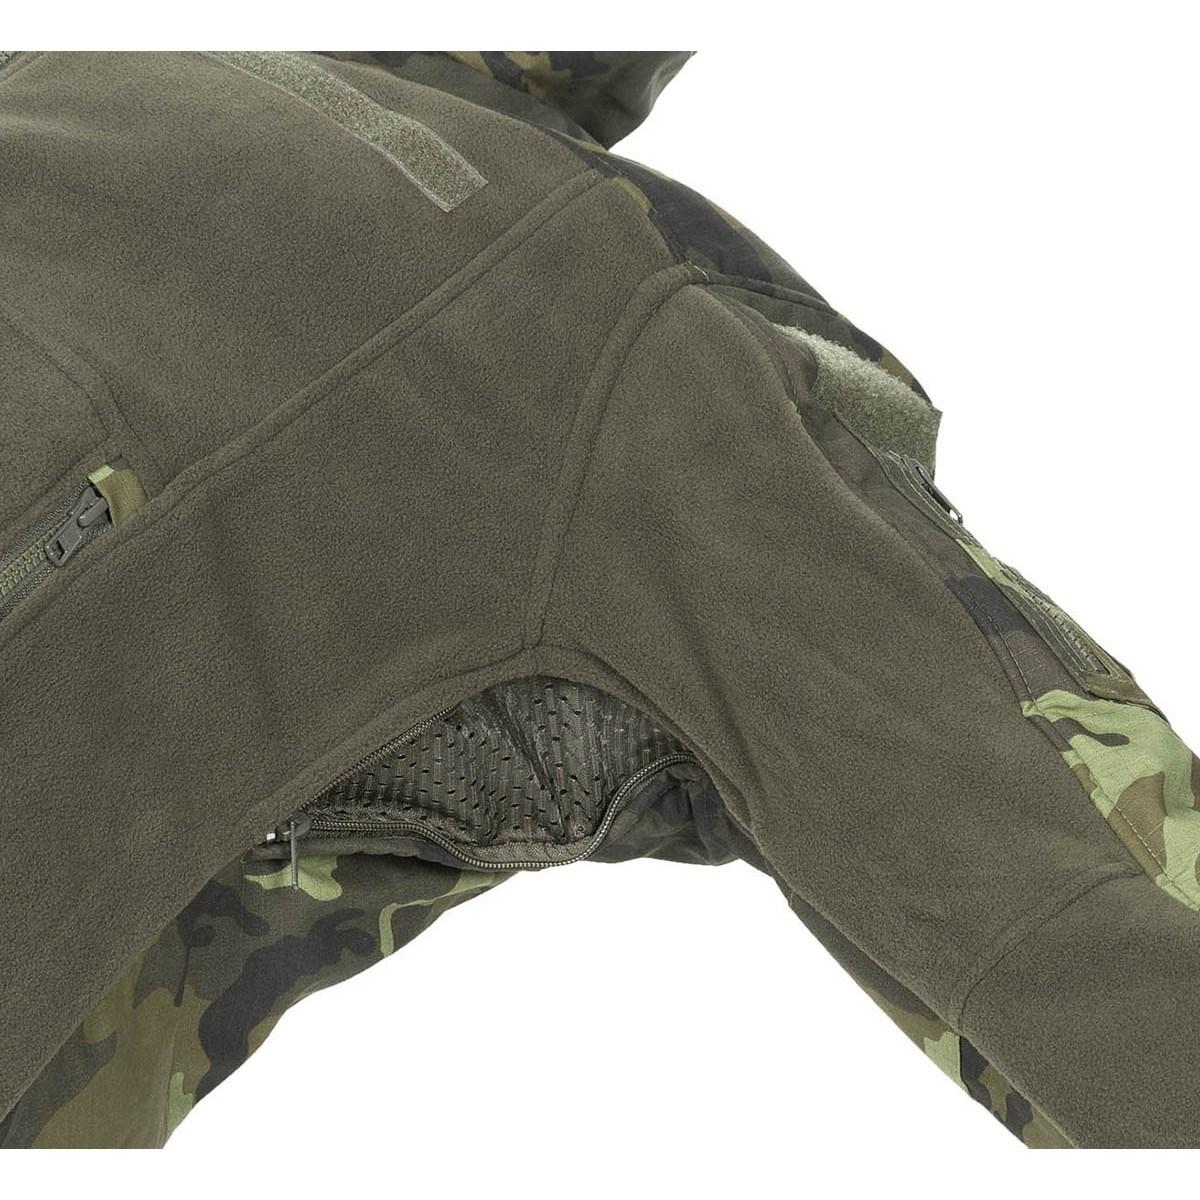 Tactical fleece jacket COMBAT czech CAMO 95 MFH Defence 03811J L-11